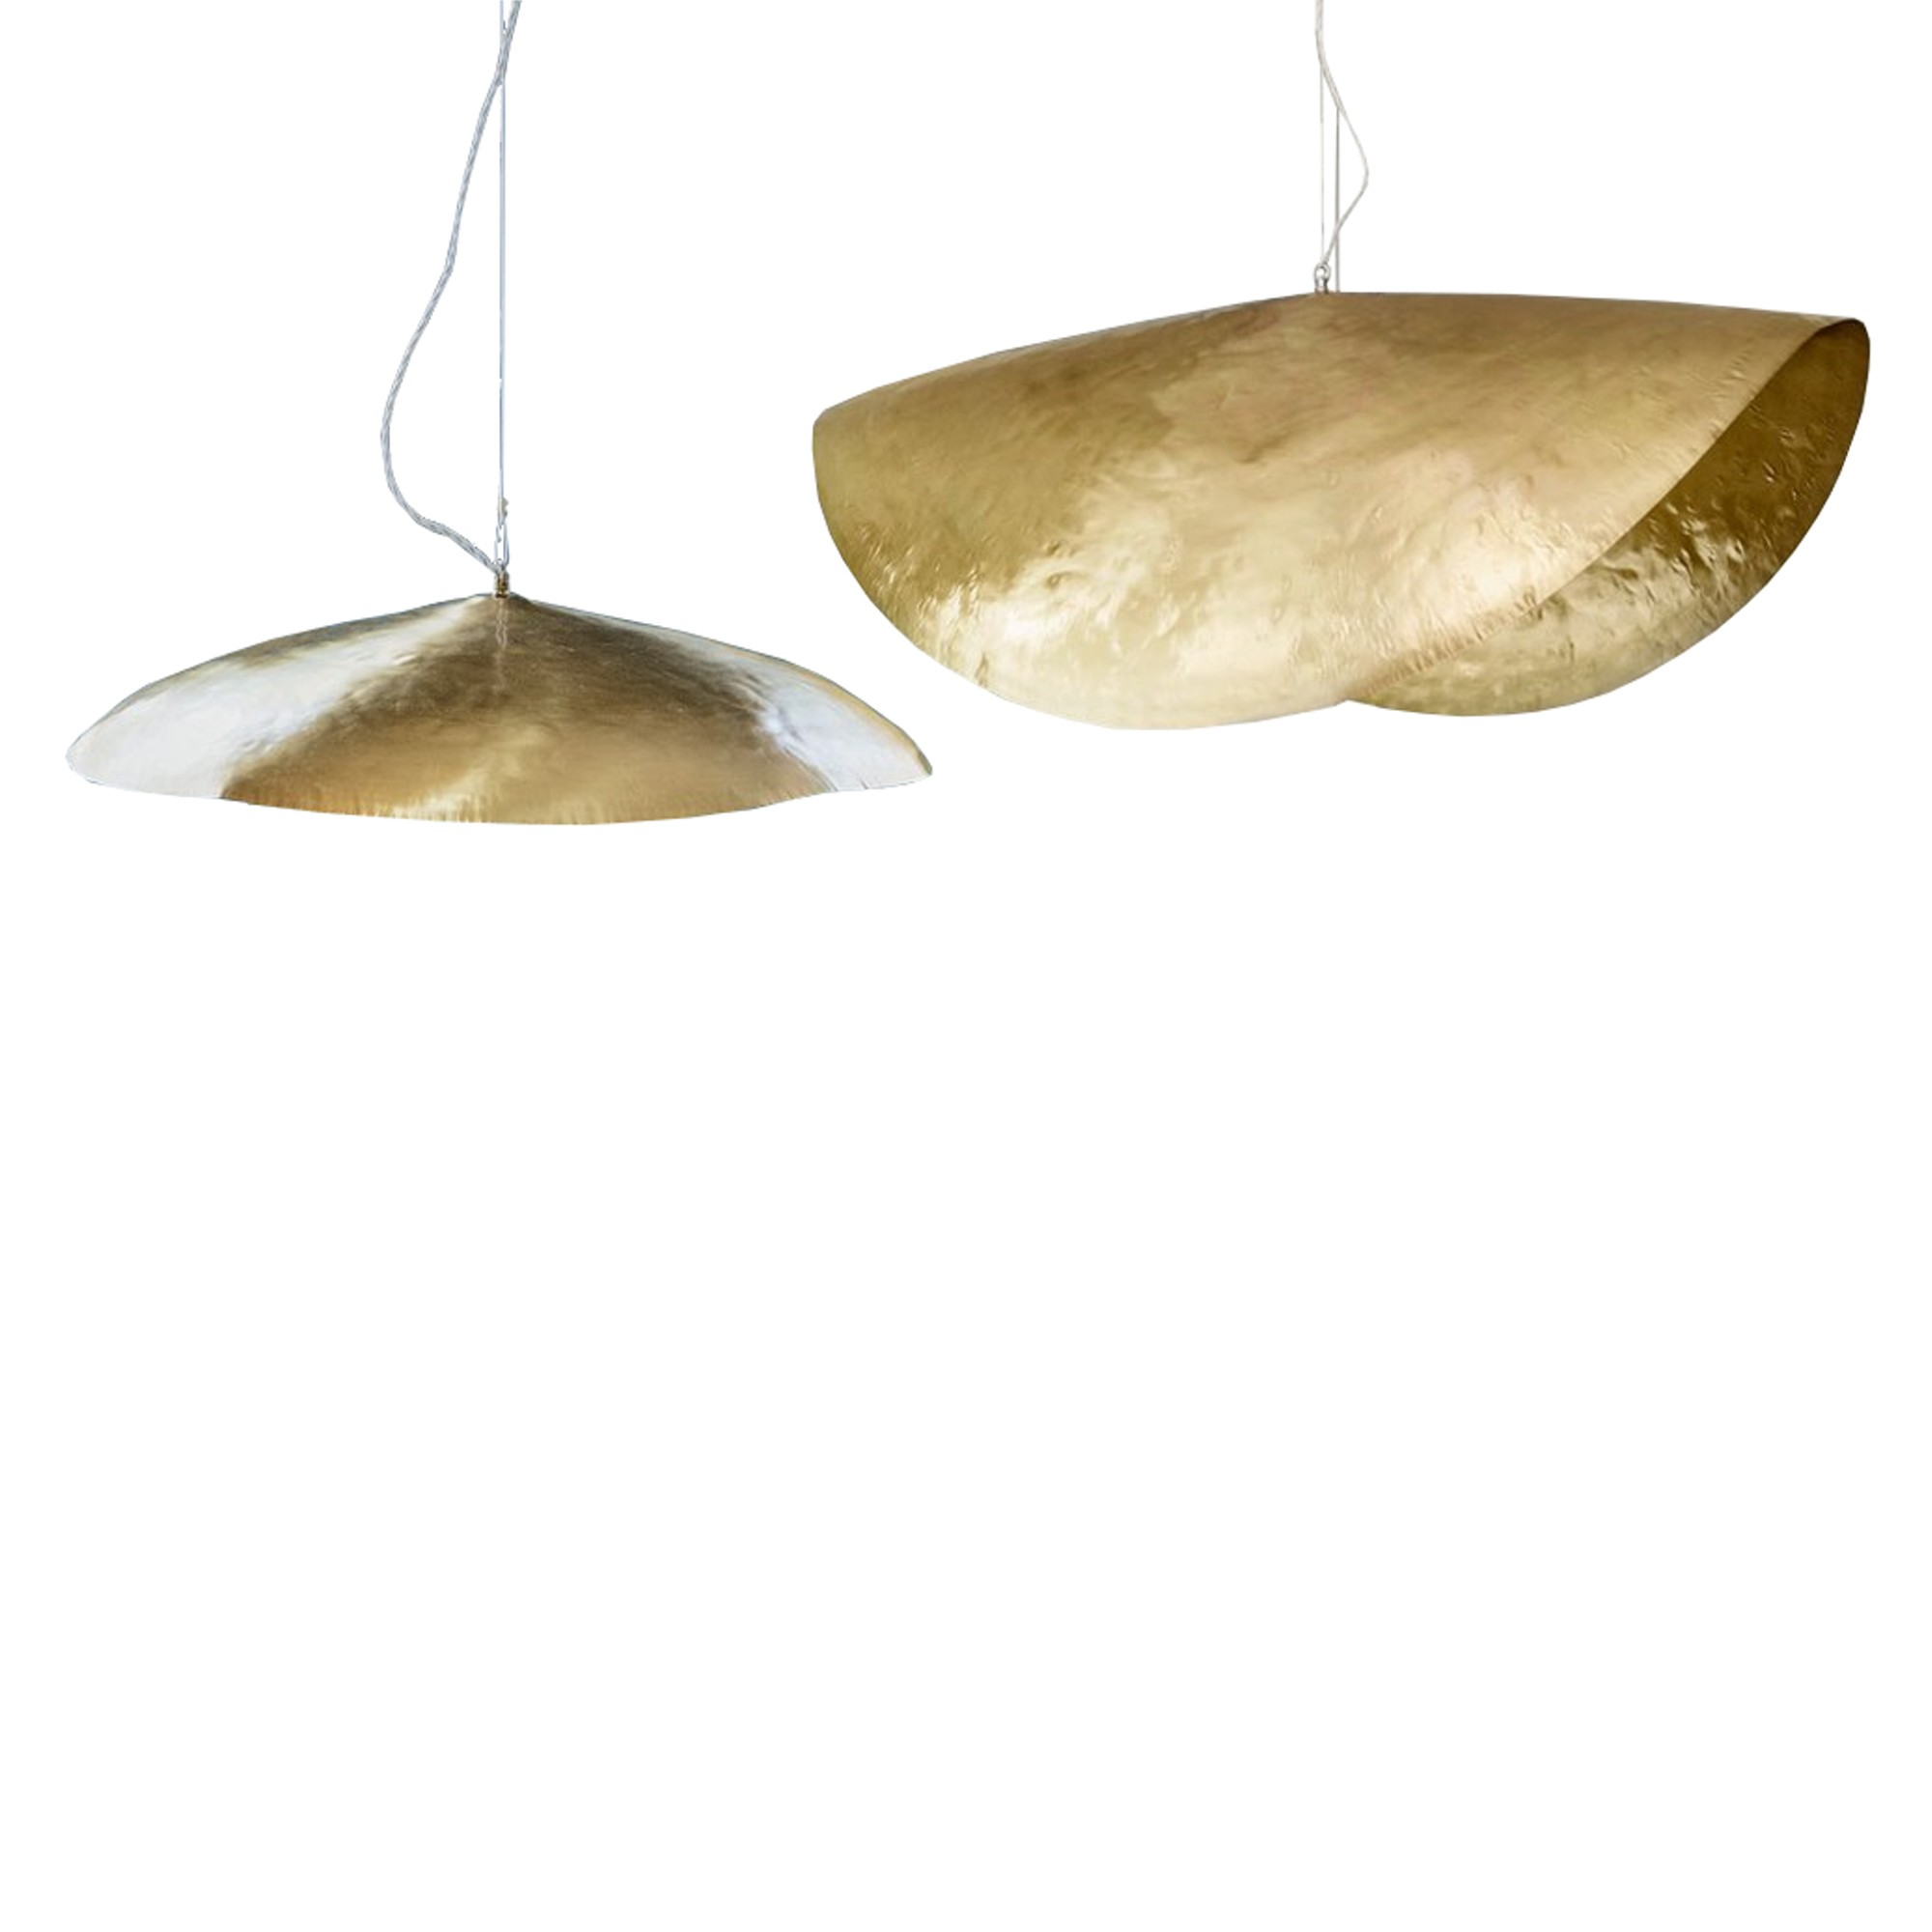 Br 95 96 Suspension Lamps